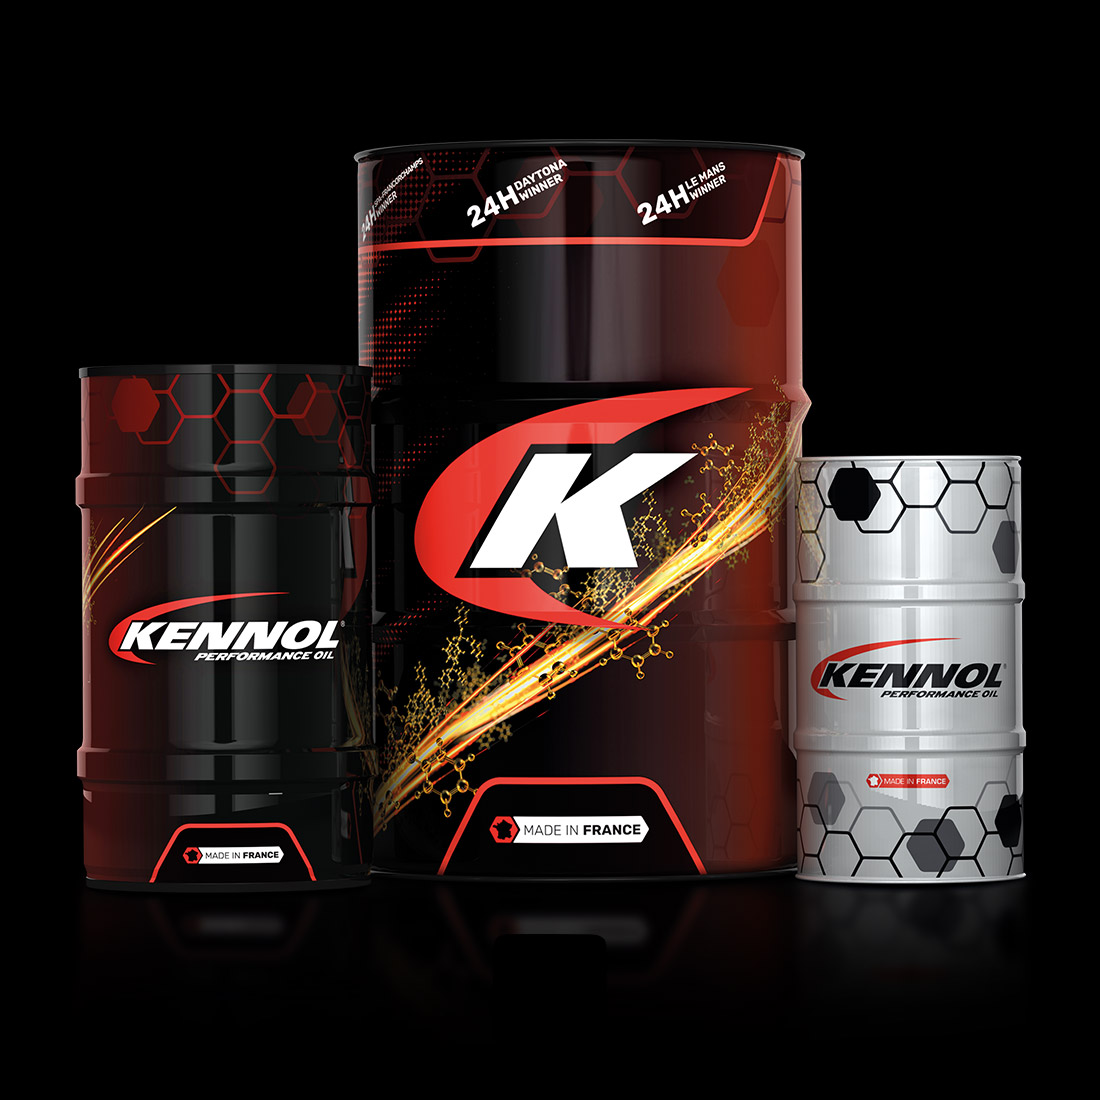 UTTOFARM | KENNOL - Performance Oil